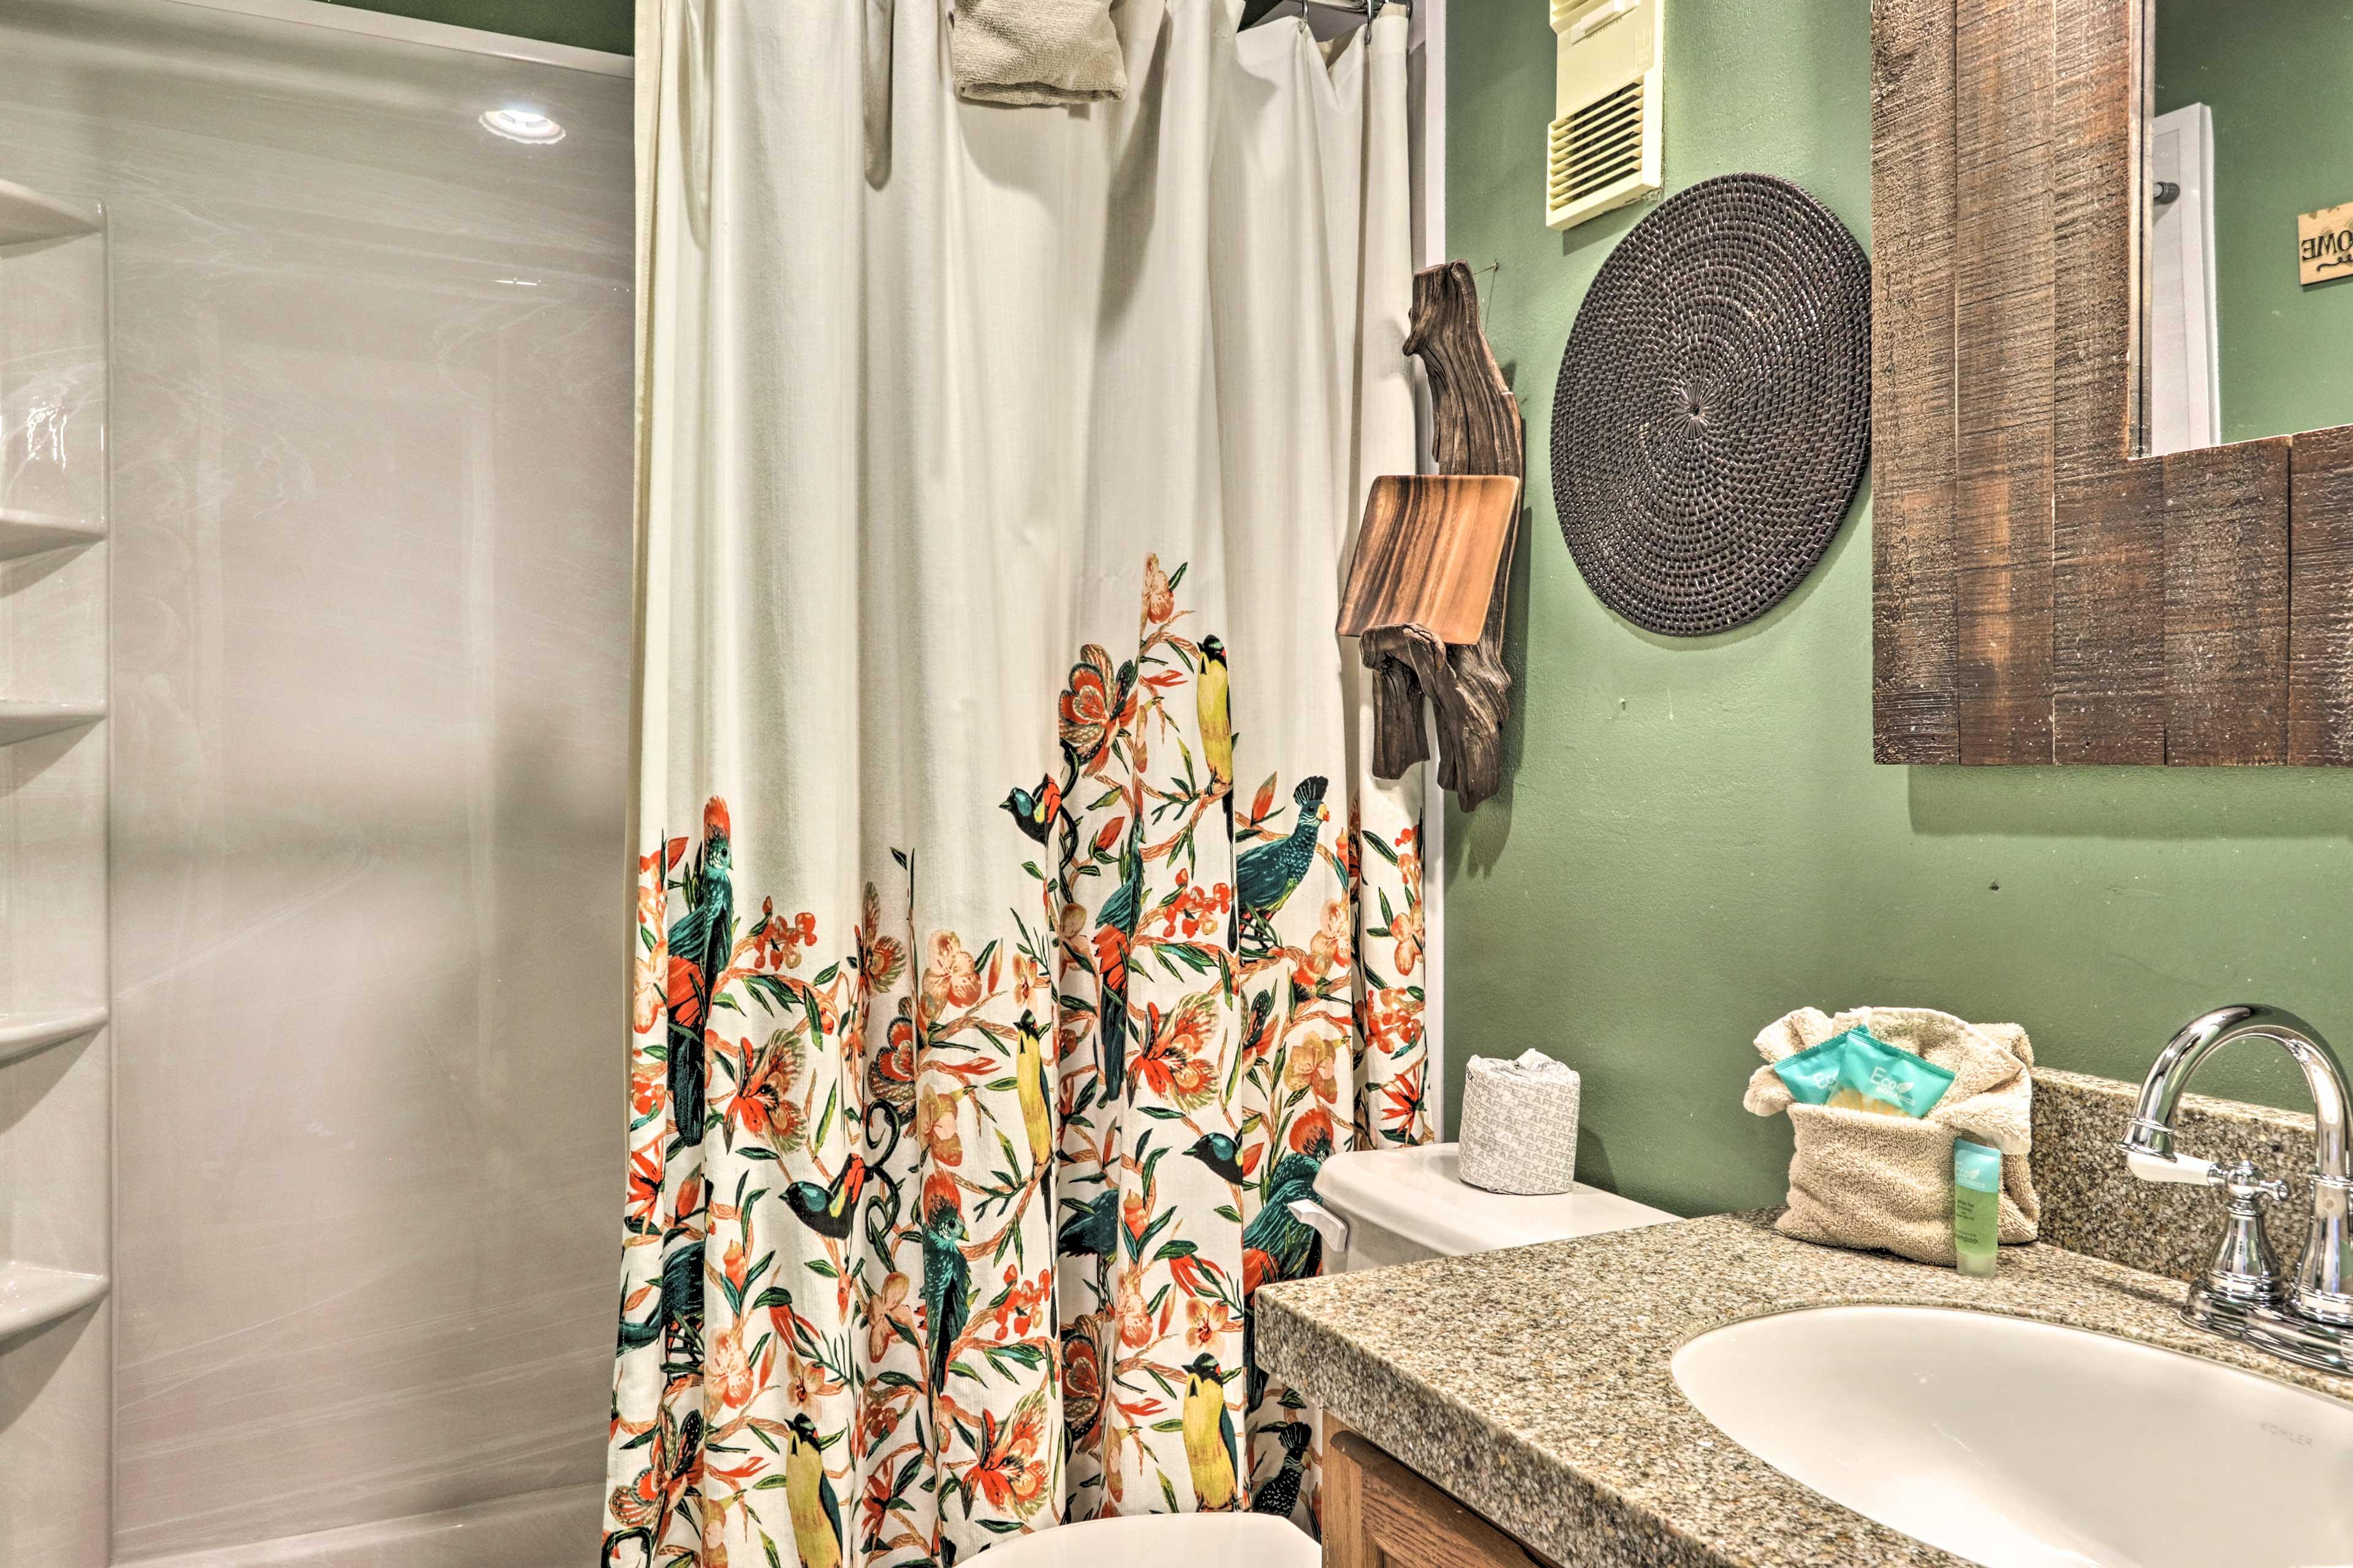 The bathroom provides basic toiletries.